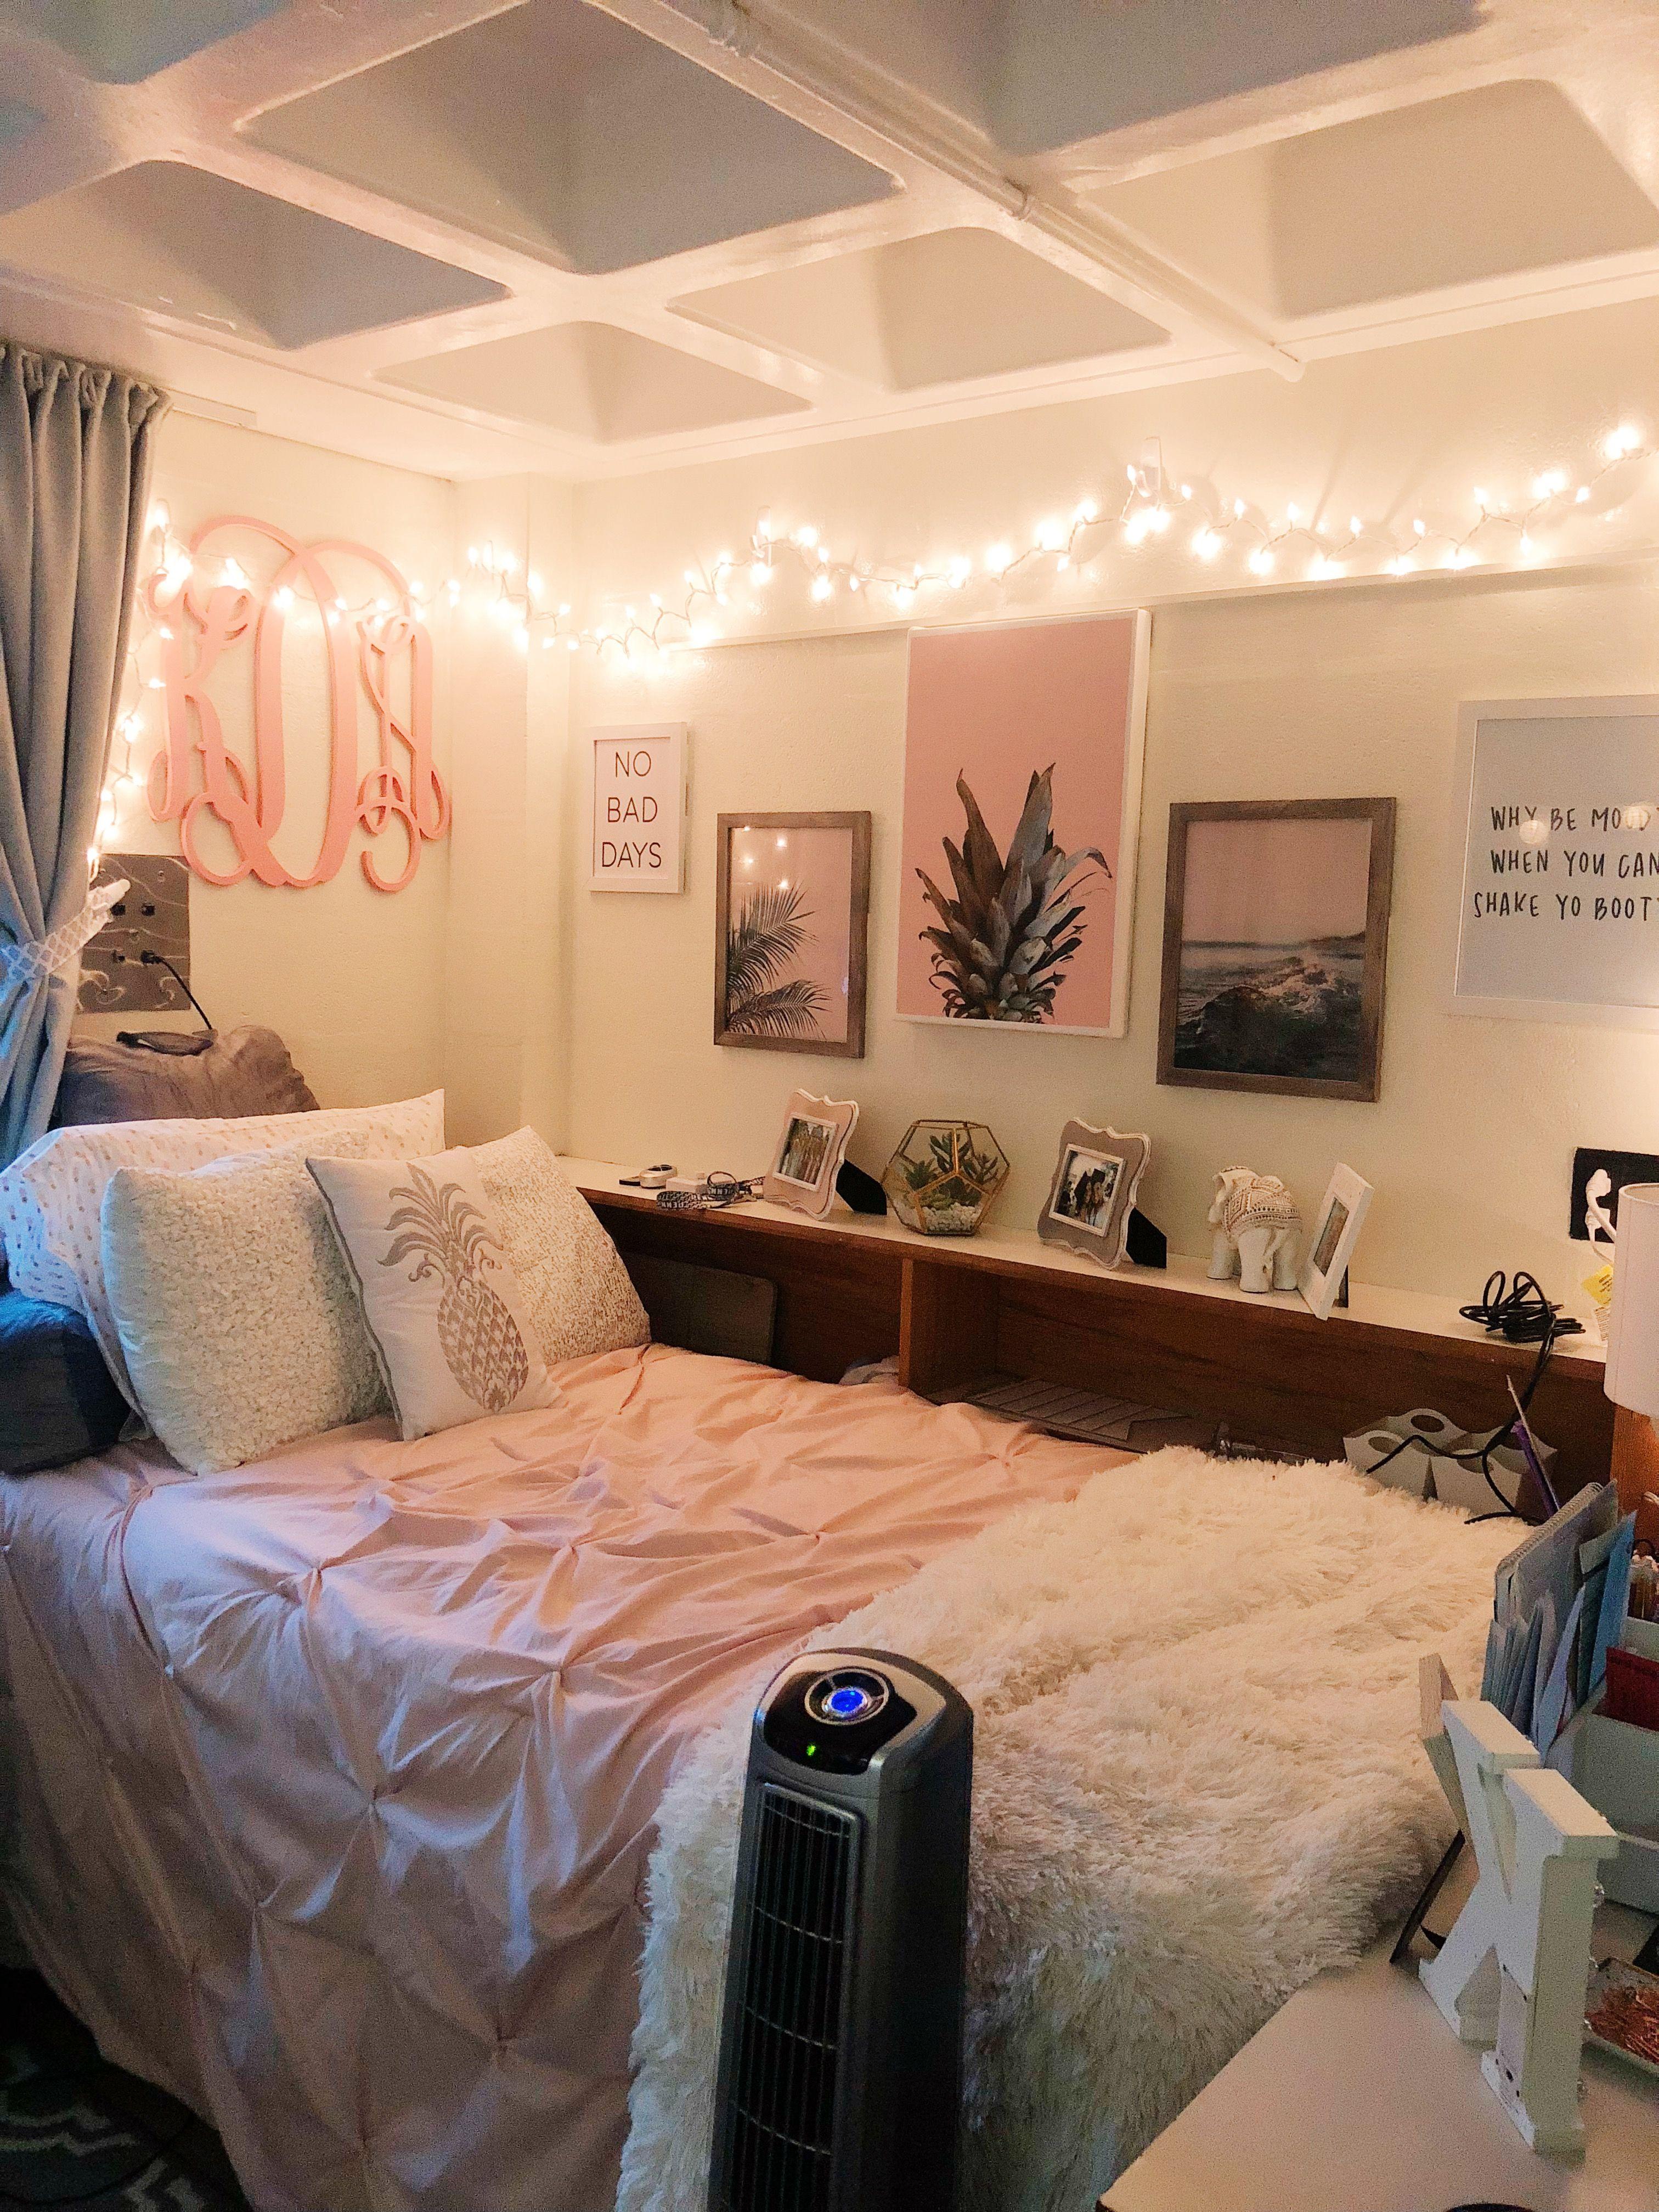 Small Dorm Room Ideas: Dorm Room Inspiration, Dorm Room Designs